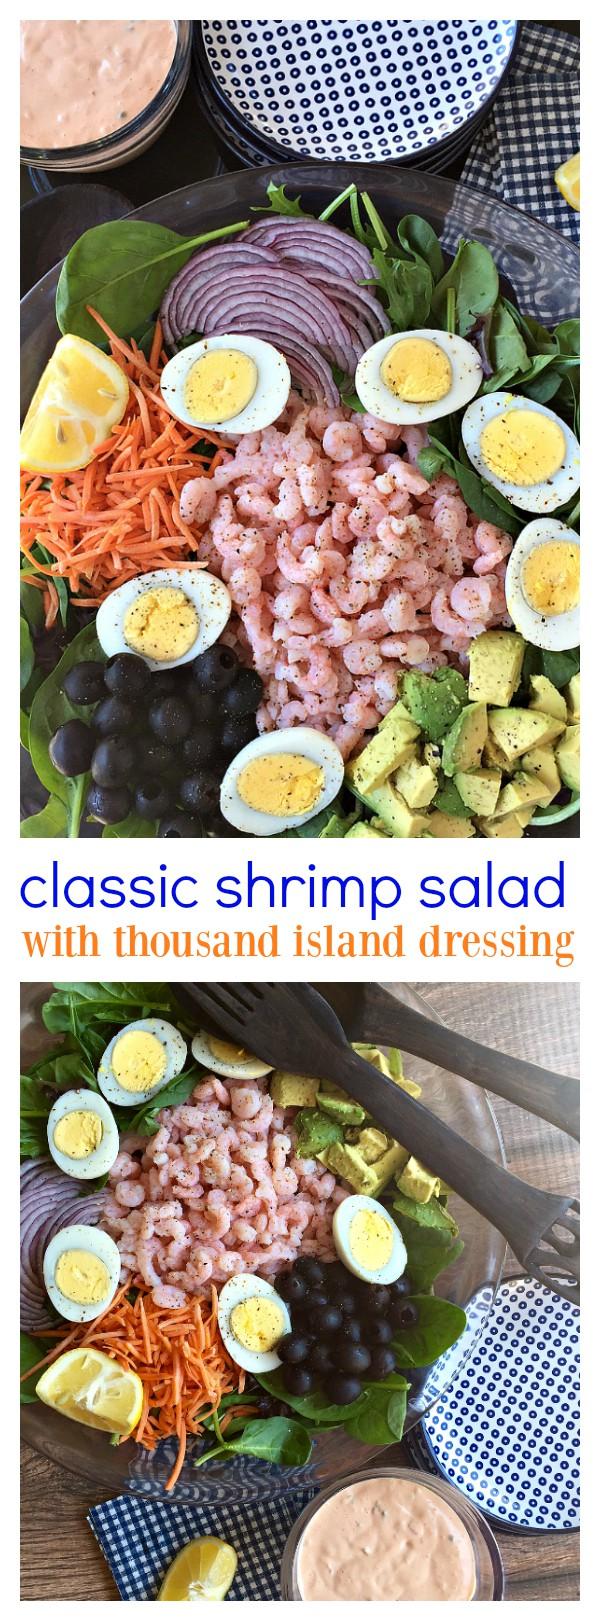 Classic Shrimp Salad with Thousand Island Dressing